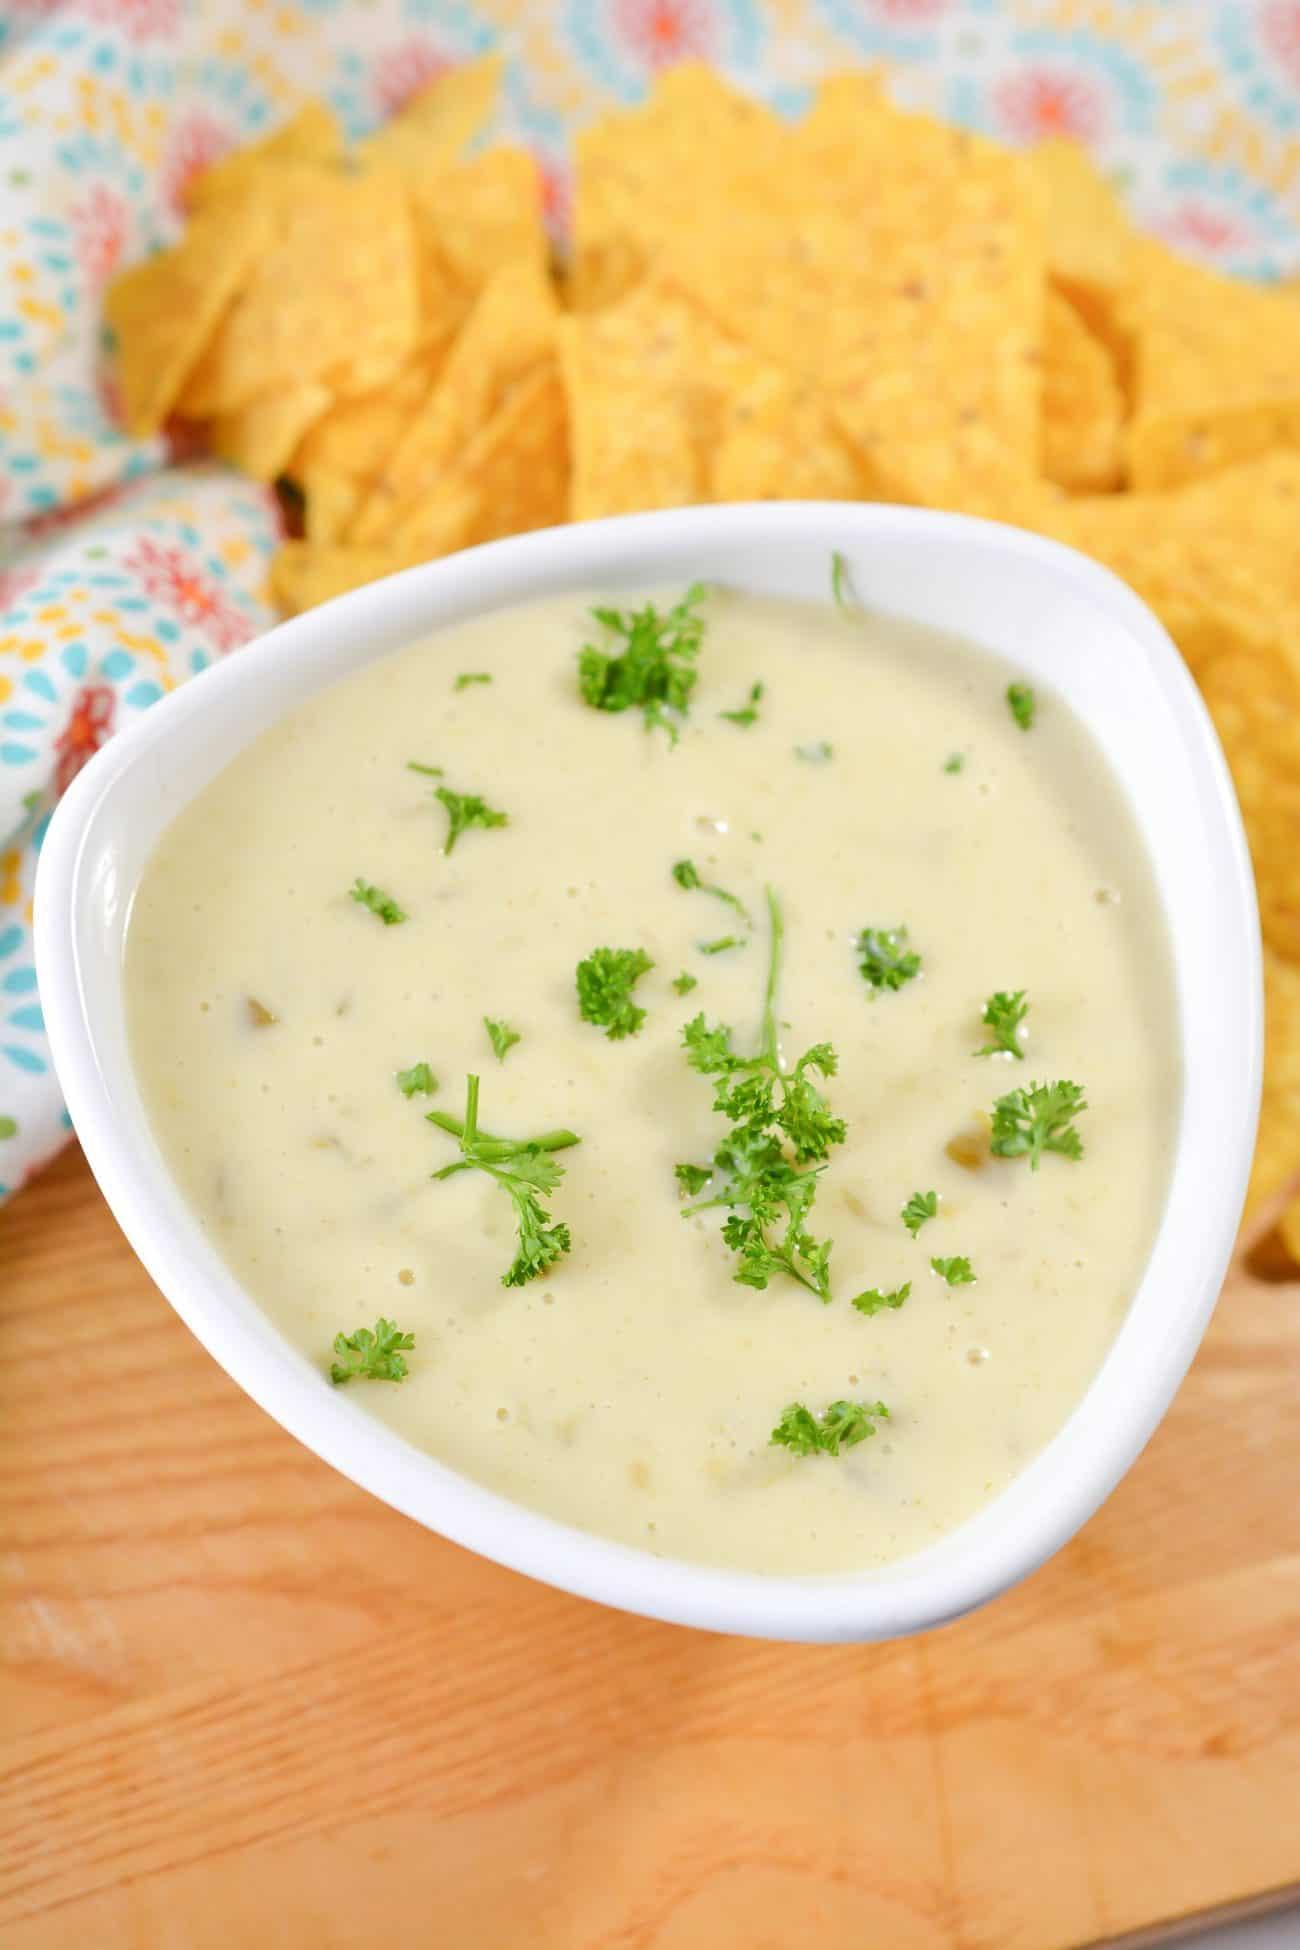 Mexican Restaurant Cheese Dip